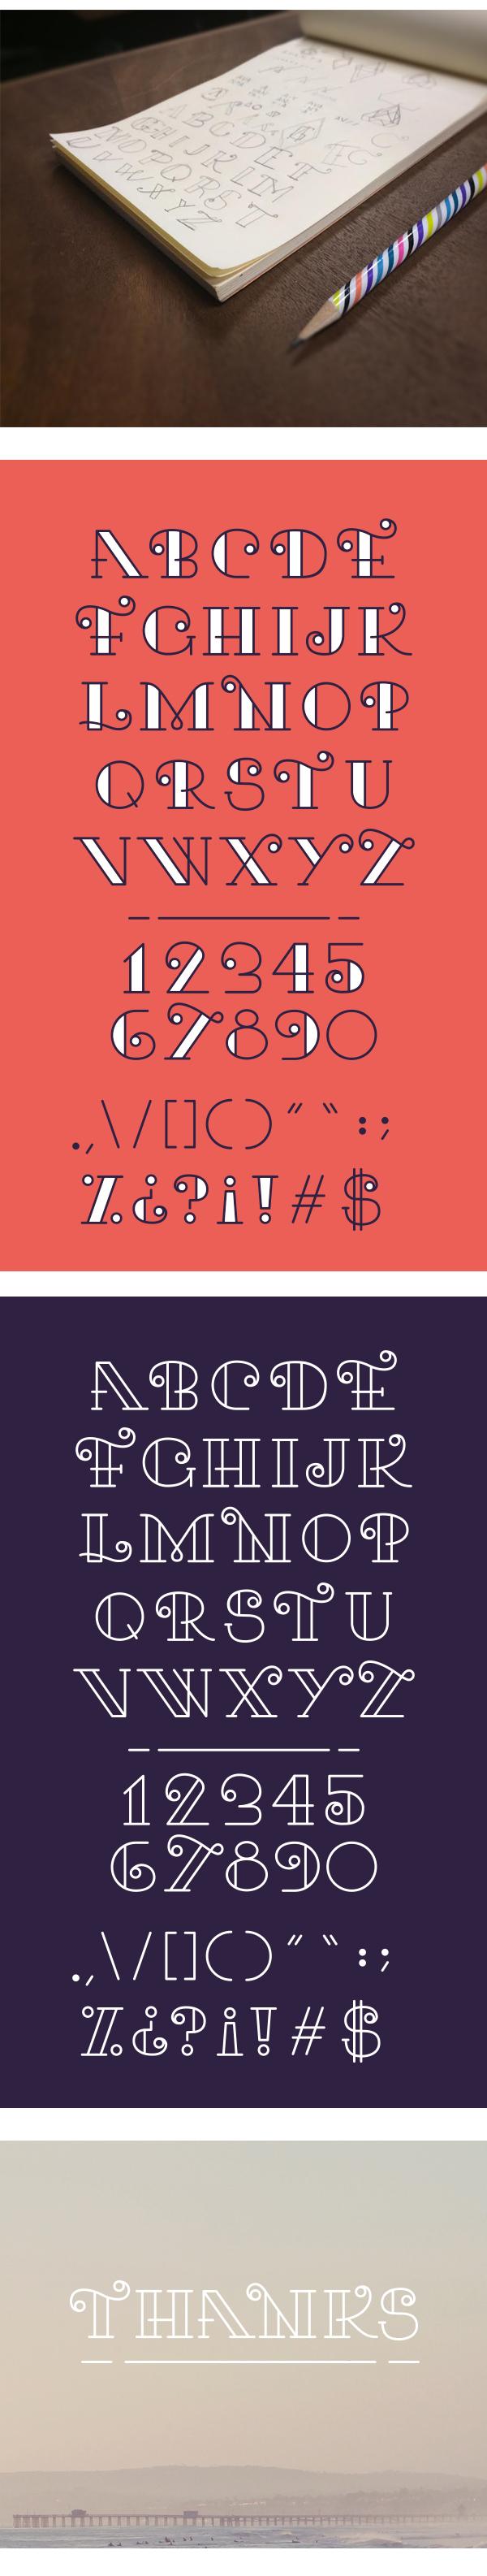 Kari Free Font Signale 中国镖局